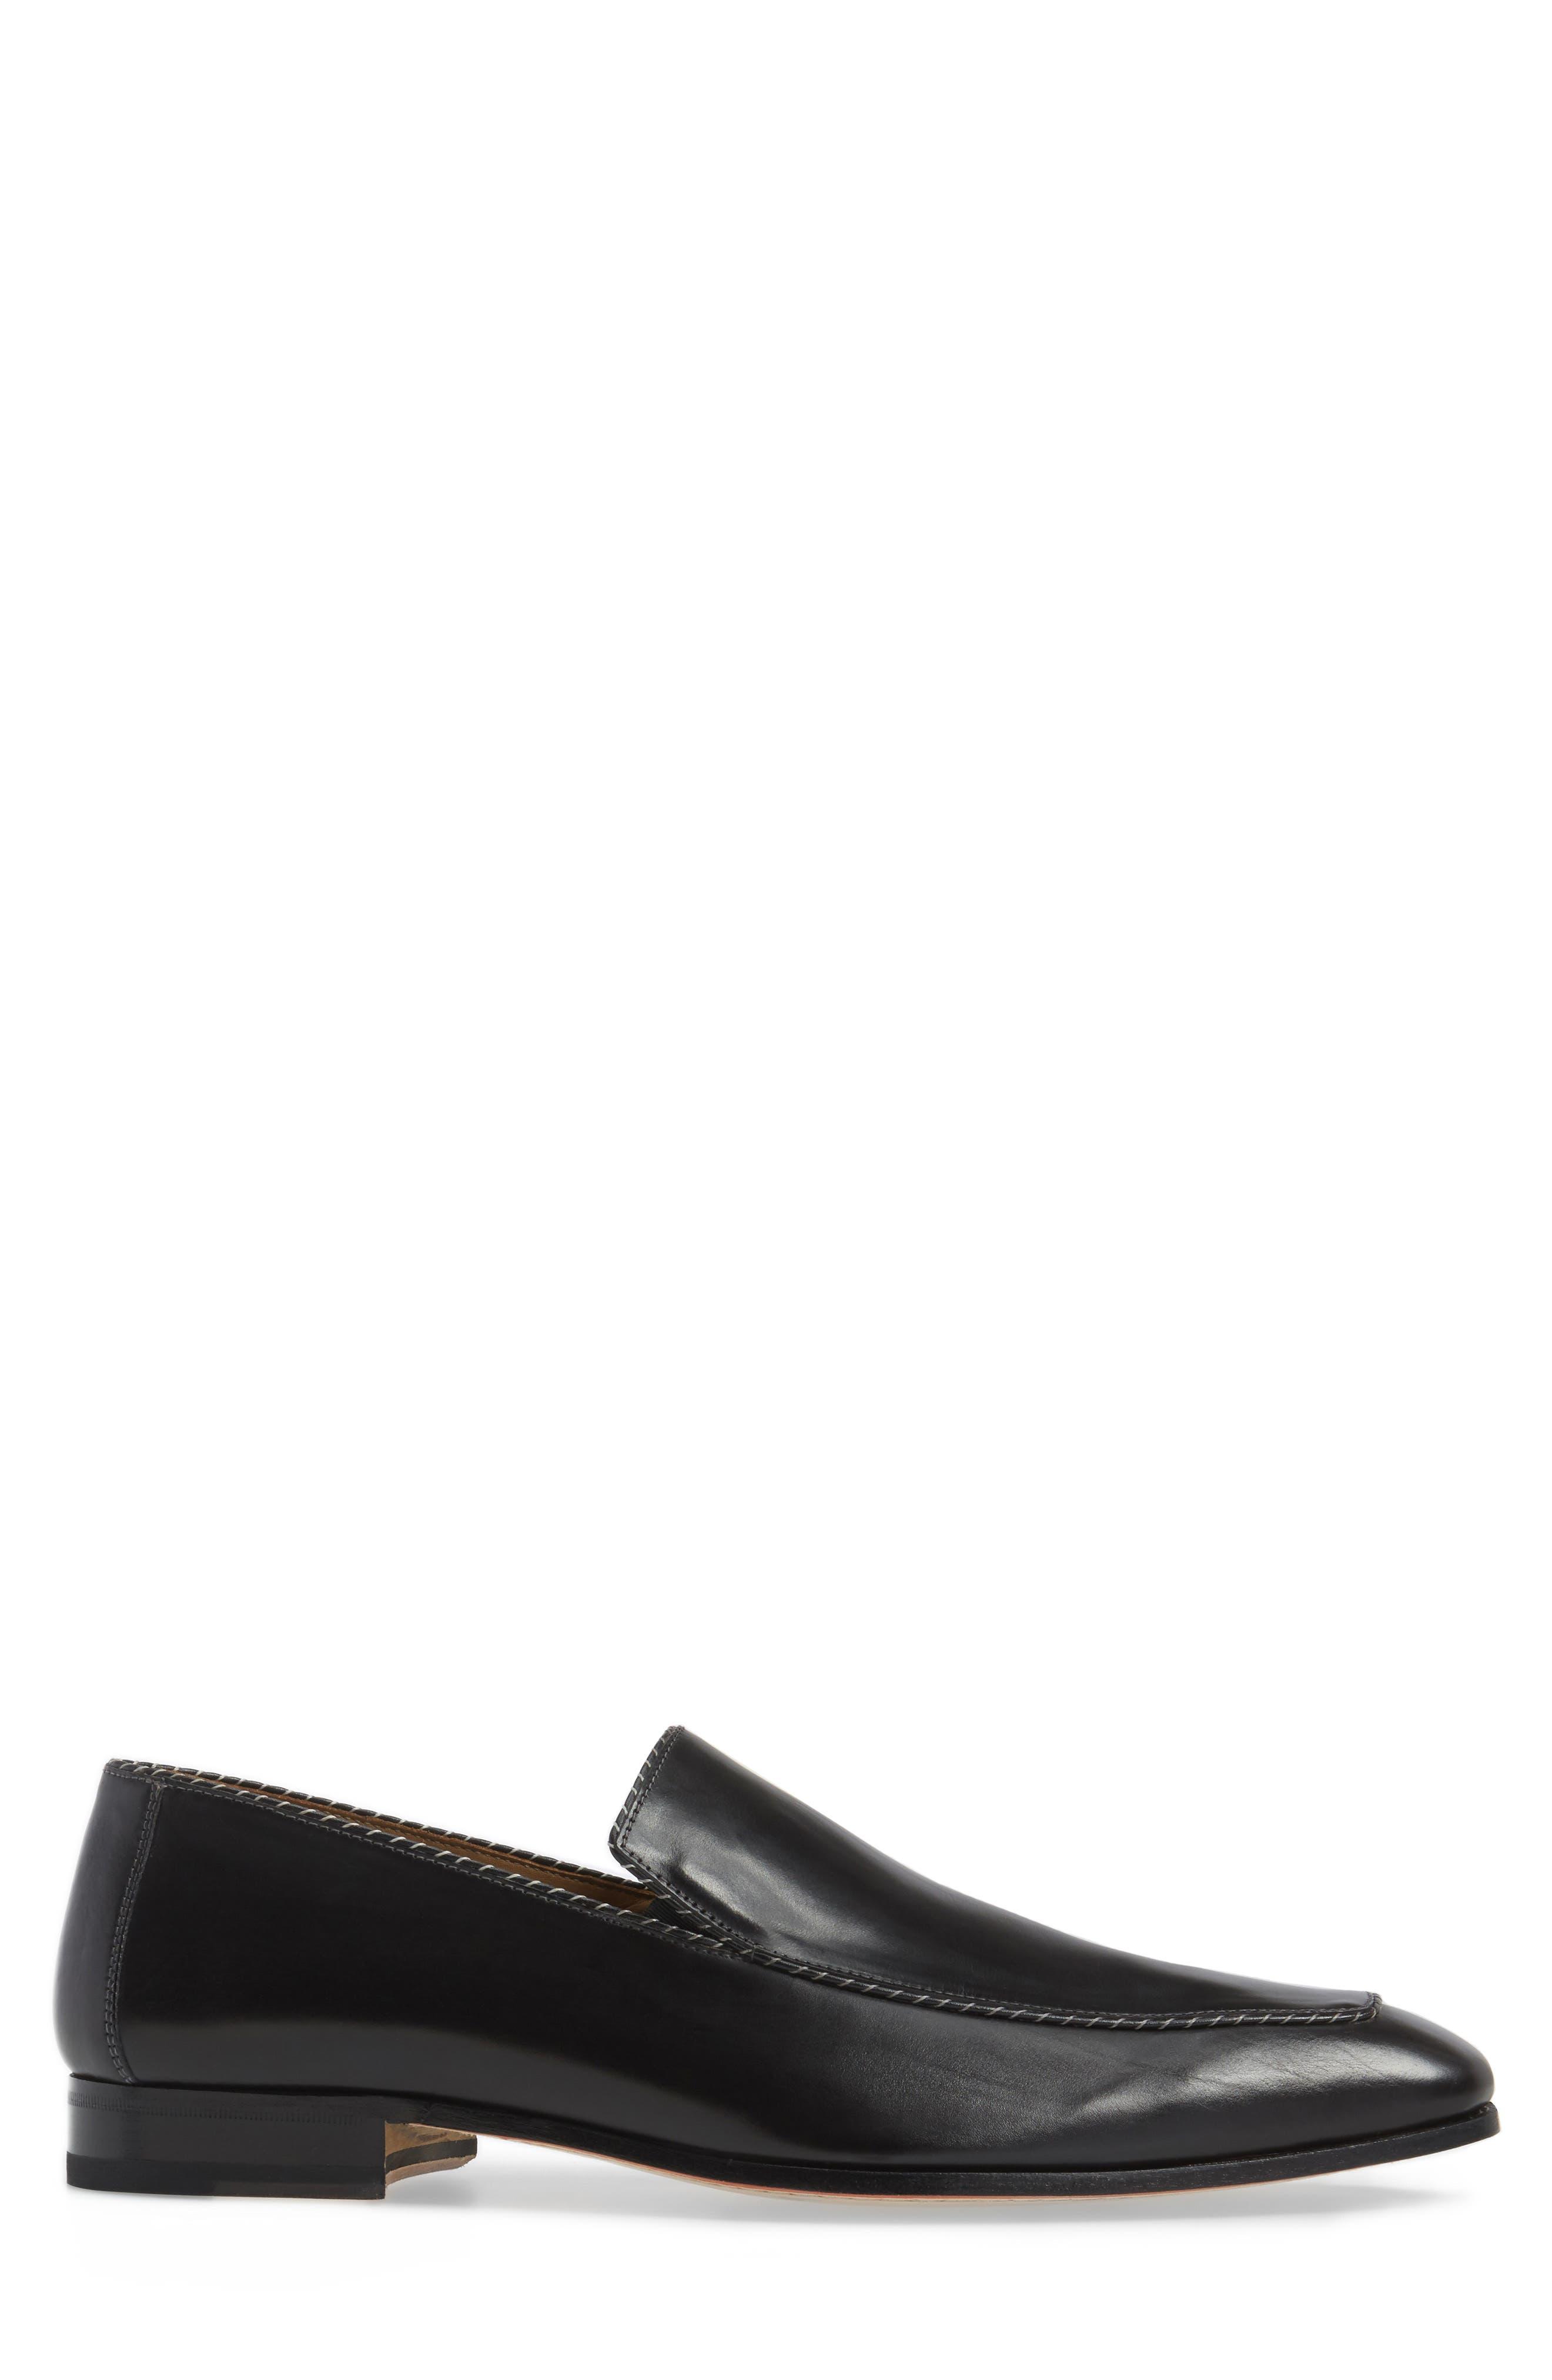 Brandt Venetian Loafer,                             Alternate thumbnail 3, color,                             Black Leather